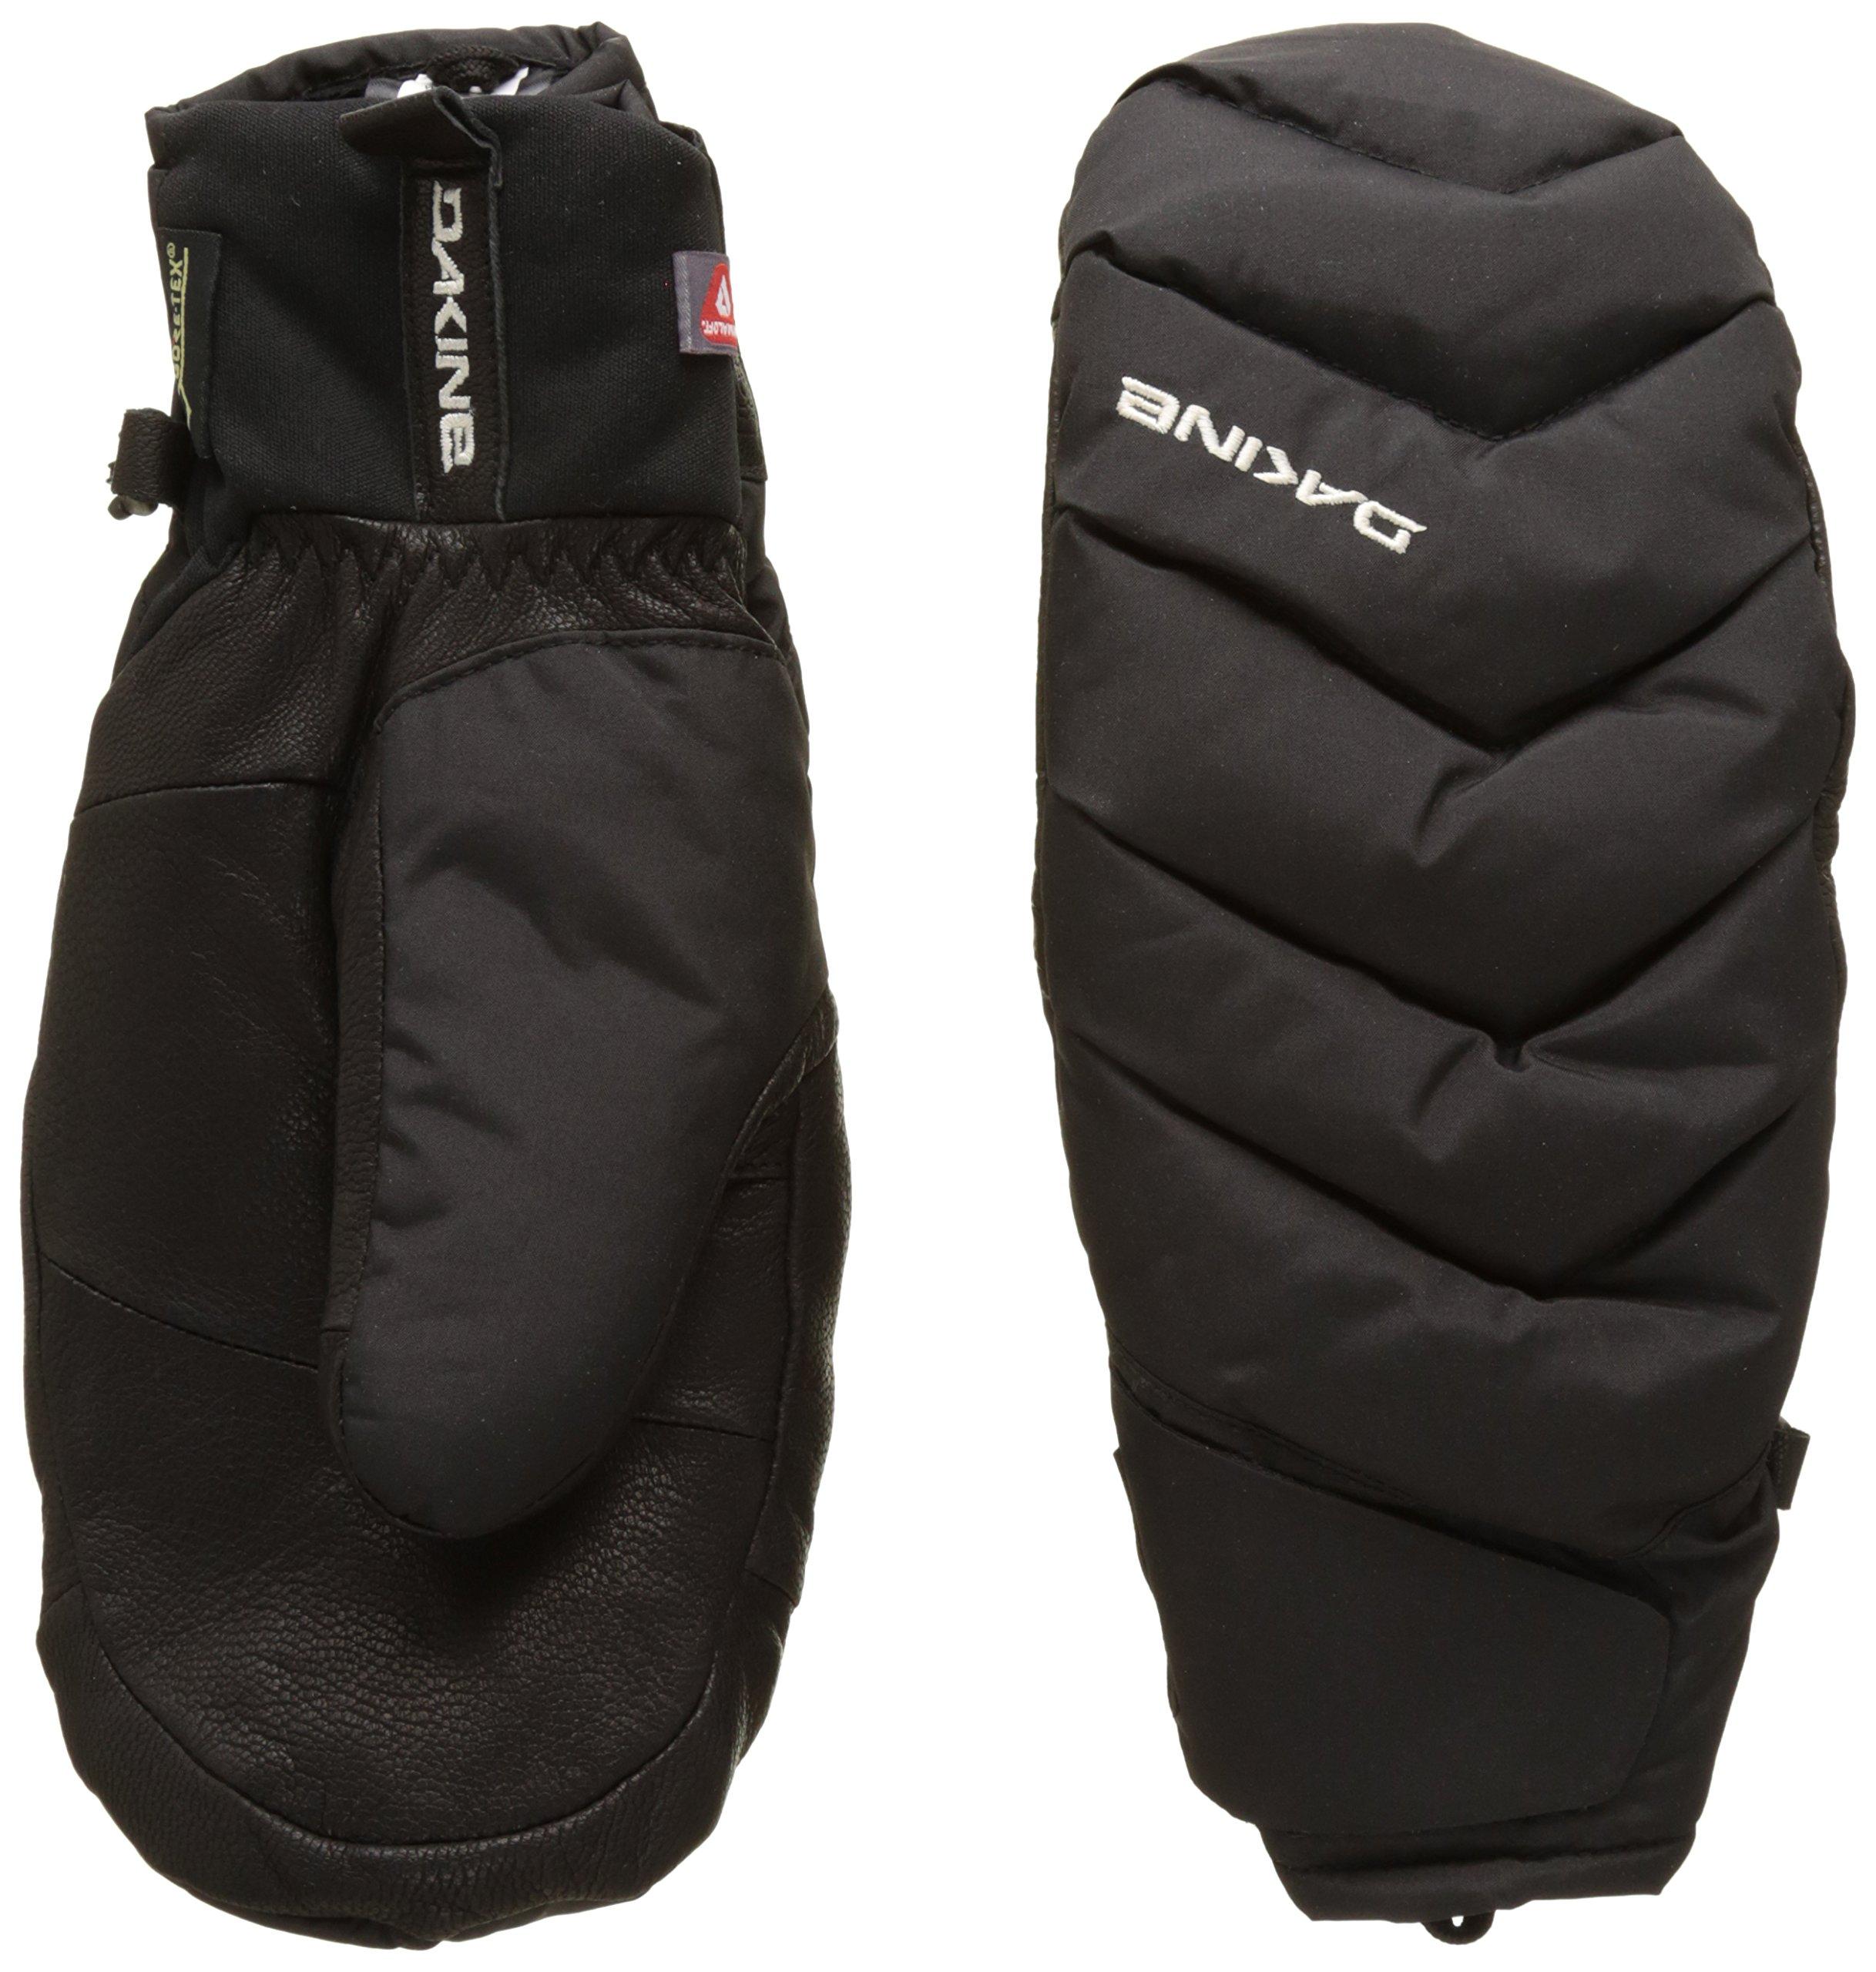 Dakine Women's Tundra Mitt Waterproof Gloves, Black, L